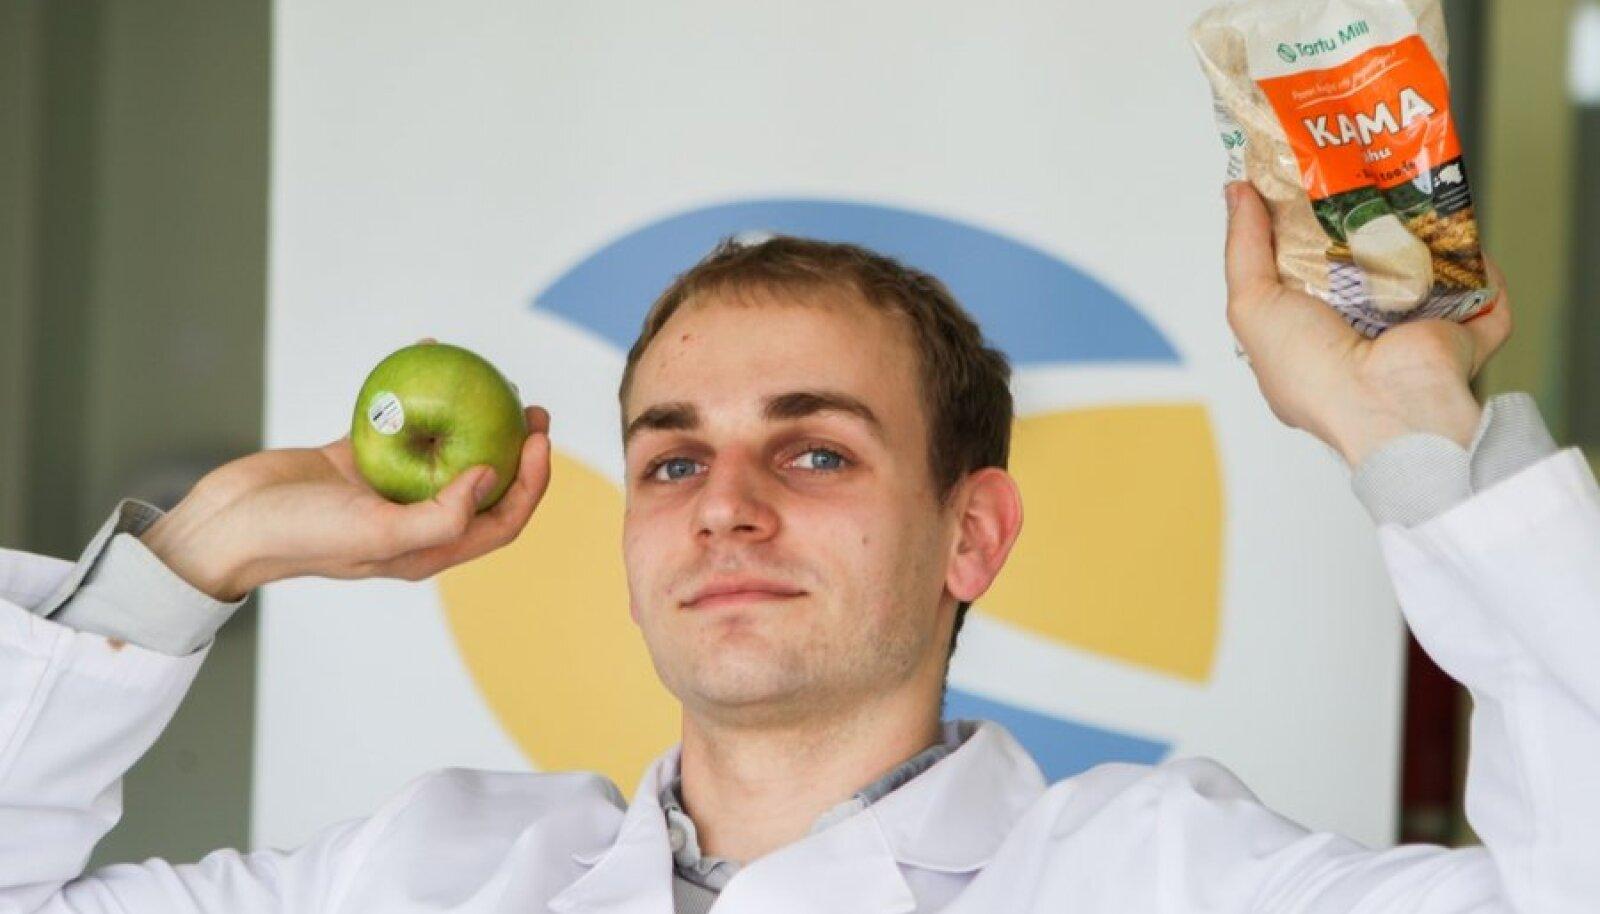 Farmaatsiatudeng Tauri, Tallinna Tervishoiu Kõrgkool